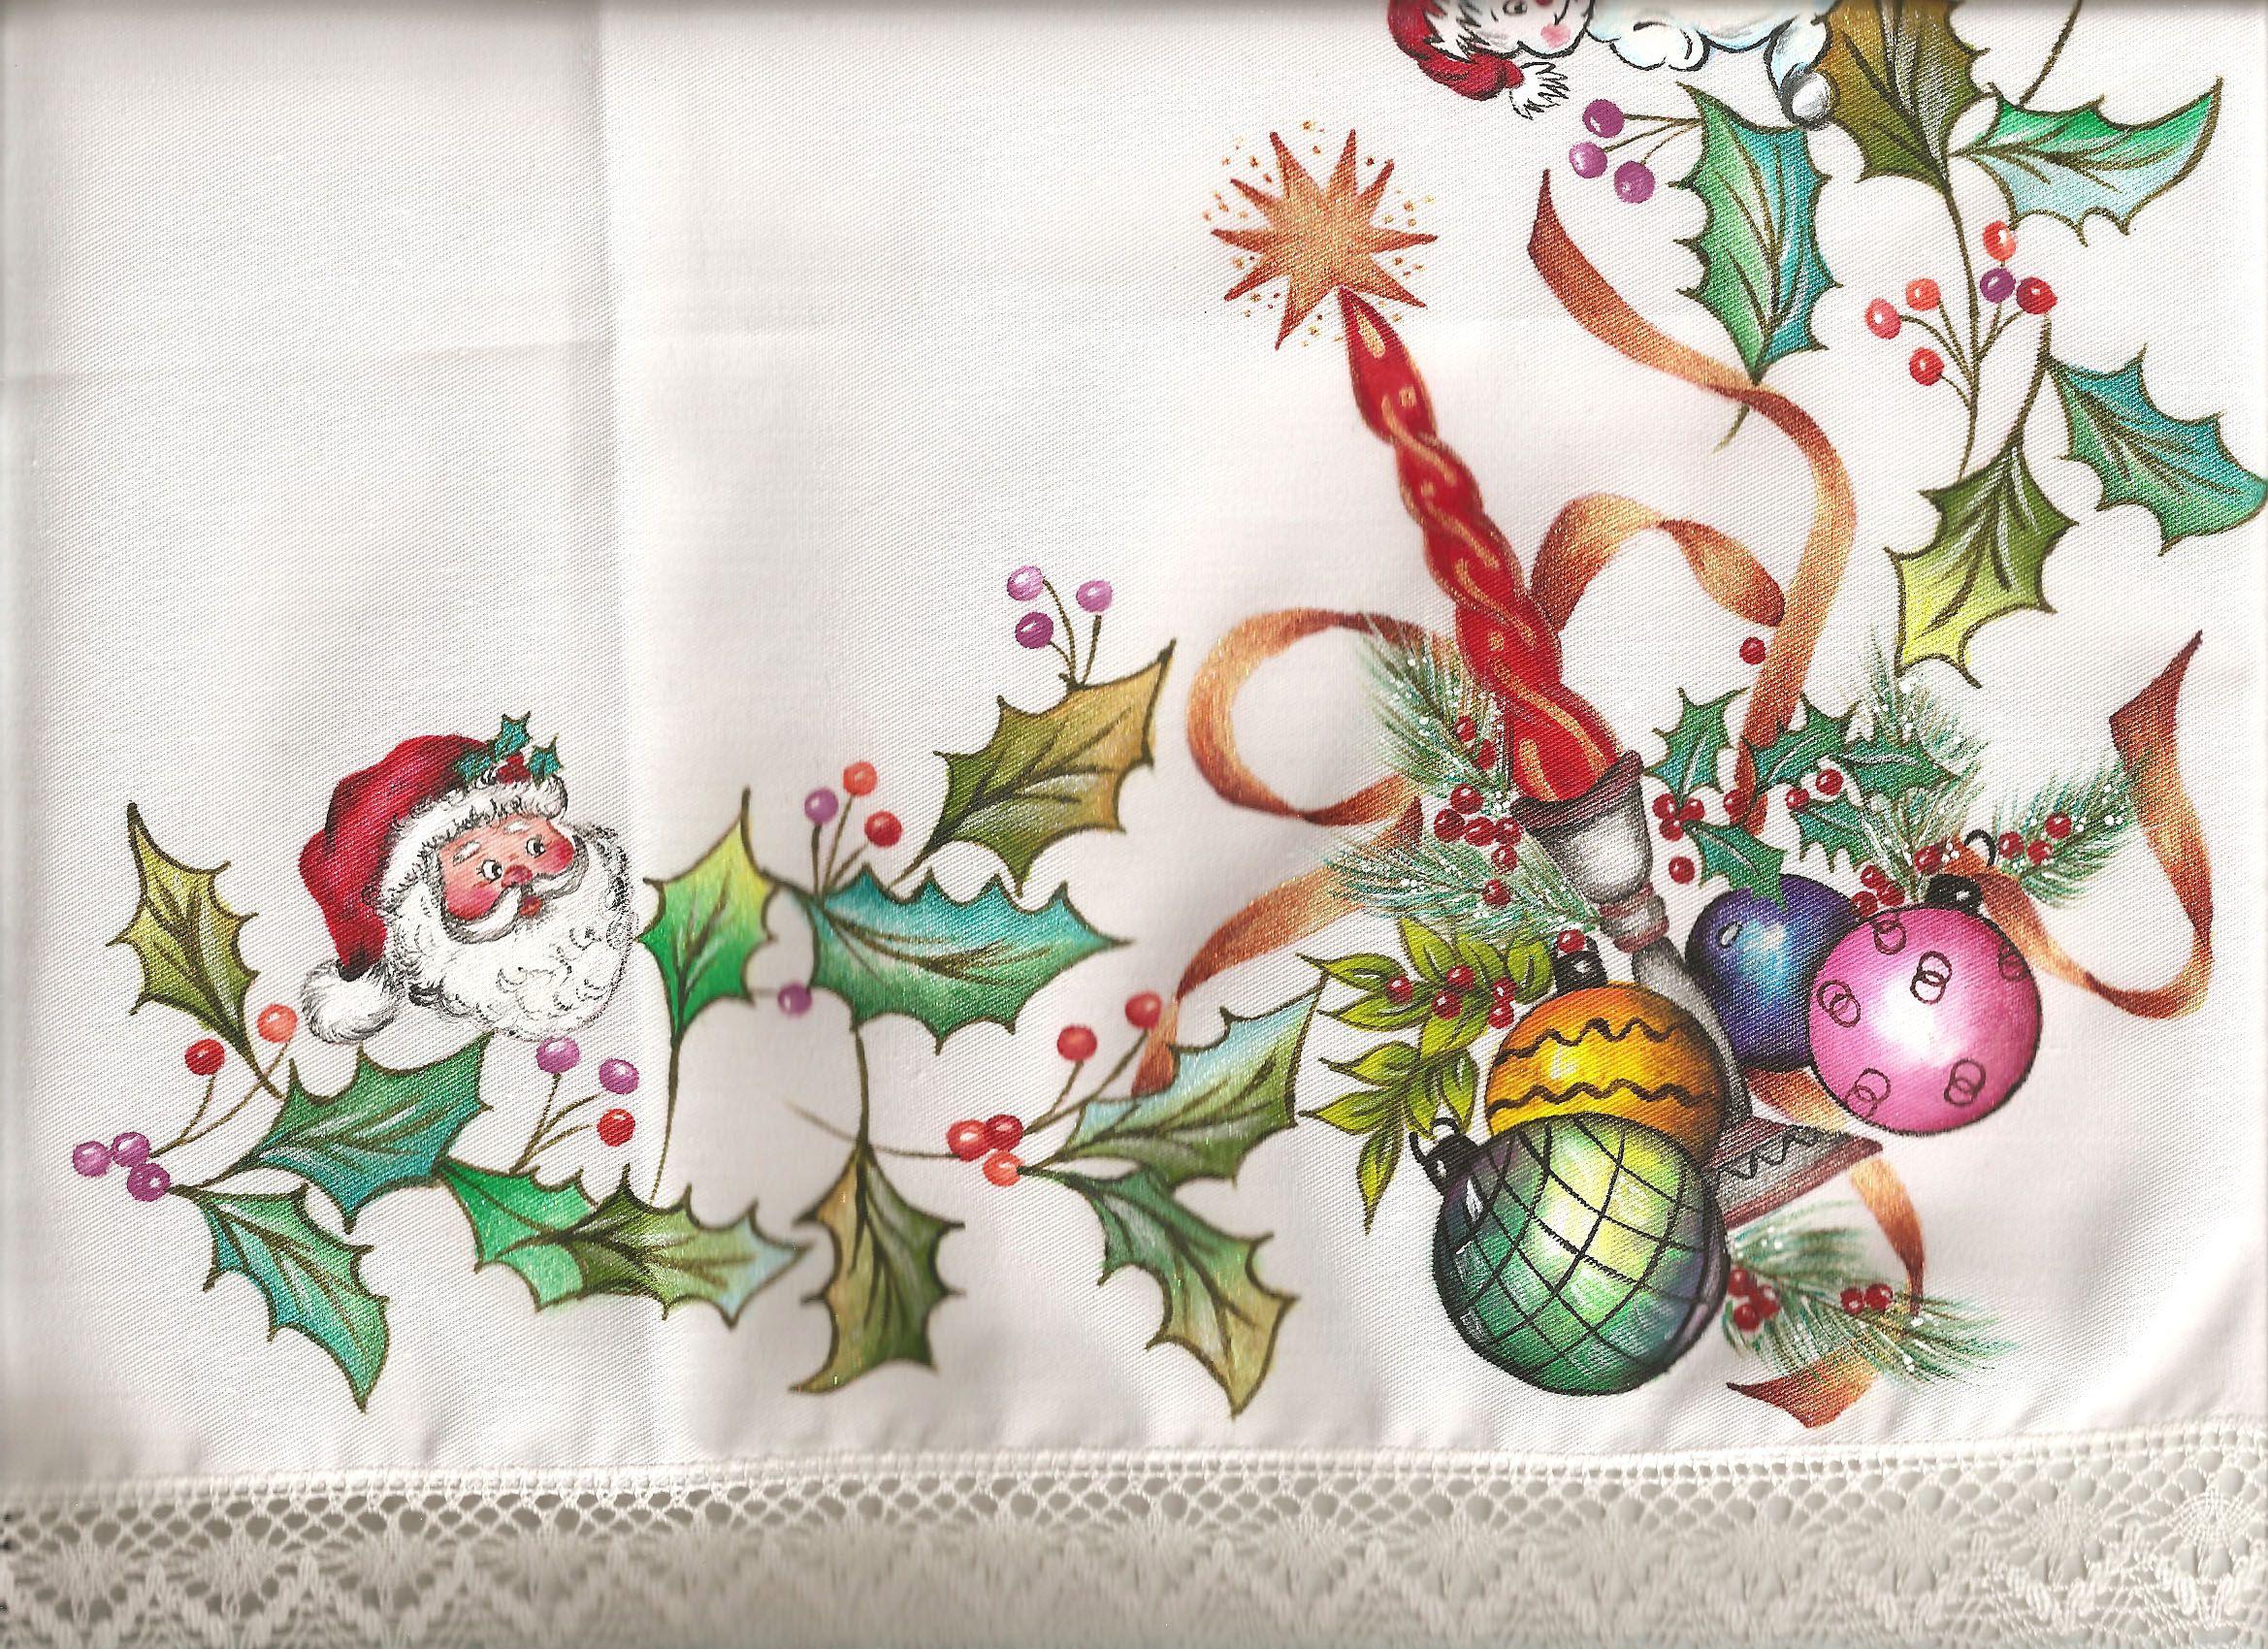 Pintura en tela esquina mantel navidad mis - Manteles de navidad ...